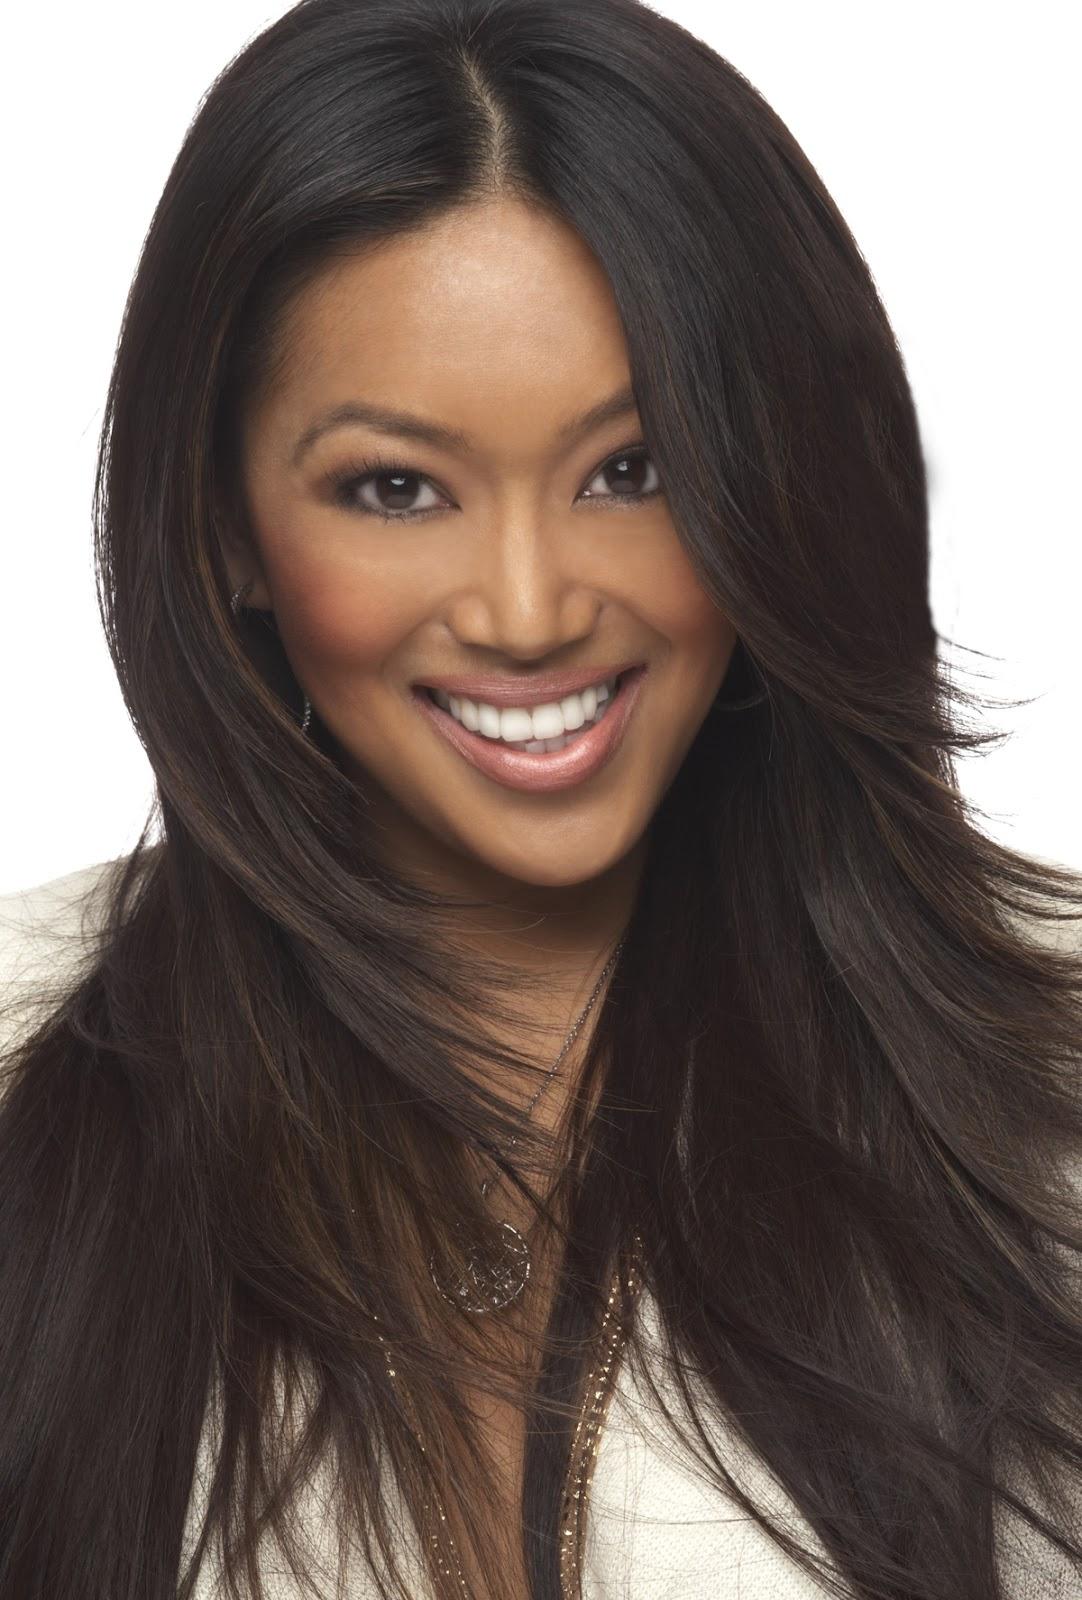 Making Beautiful Happen: Makeup Artist Spotlight: Mally Roncal